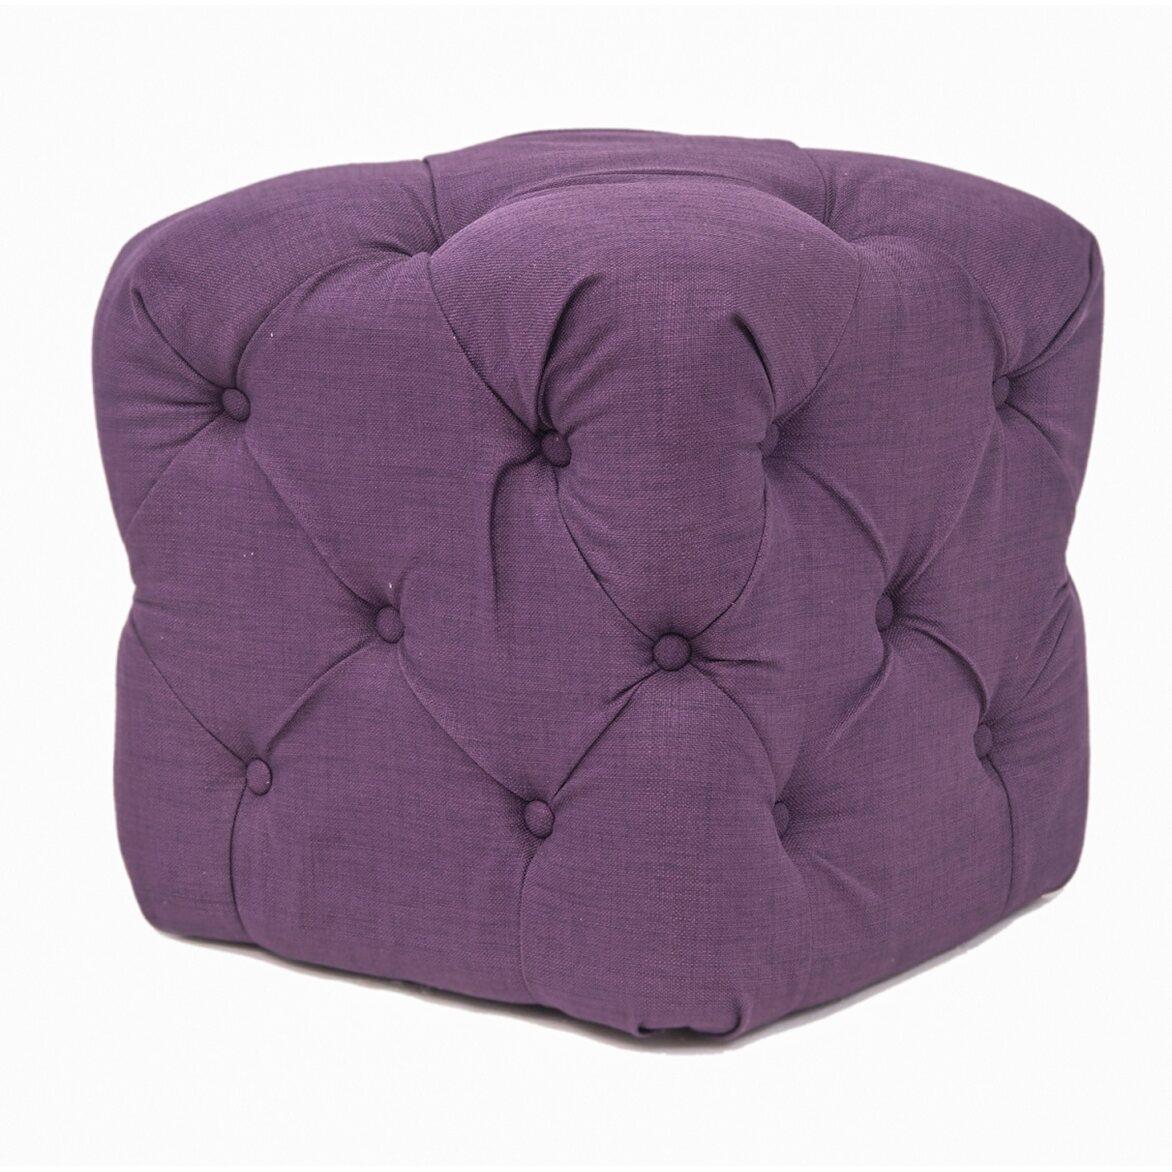 Пуф Amrit purple 2 | Пуфы Kingsby